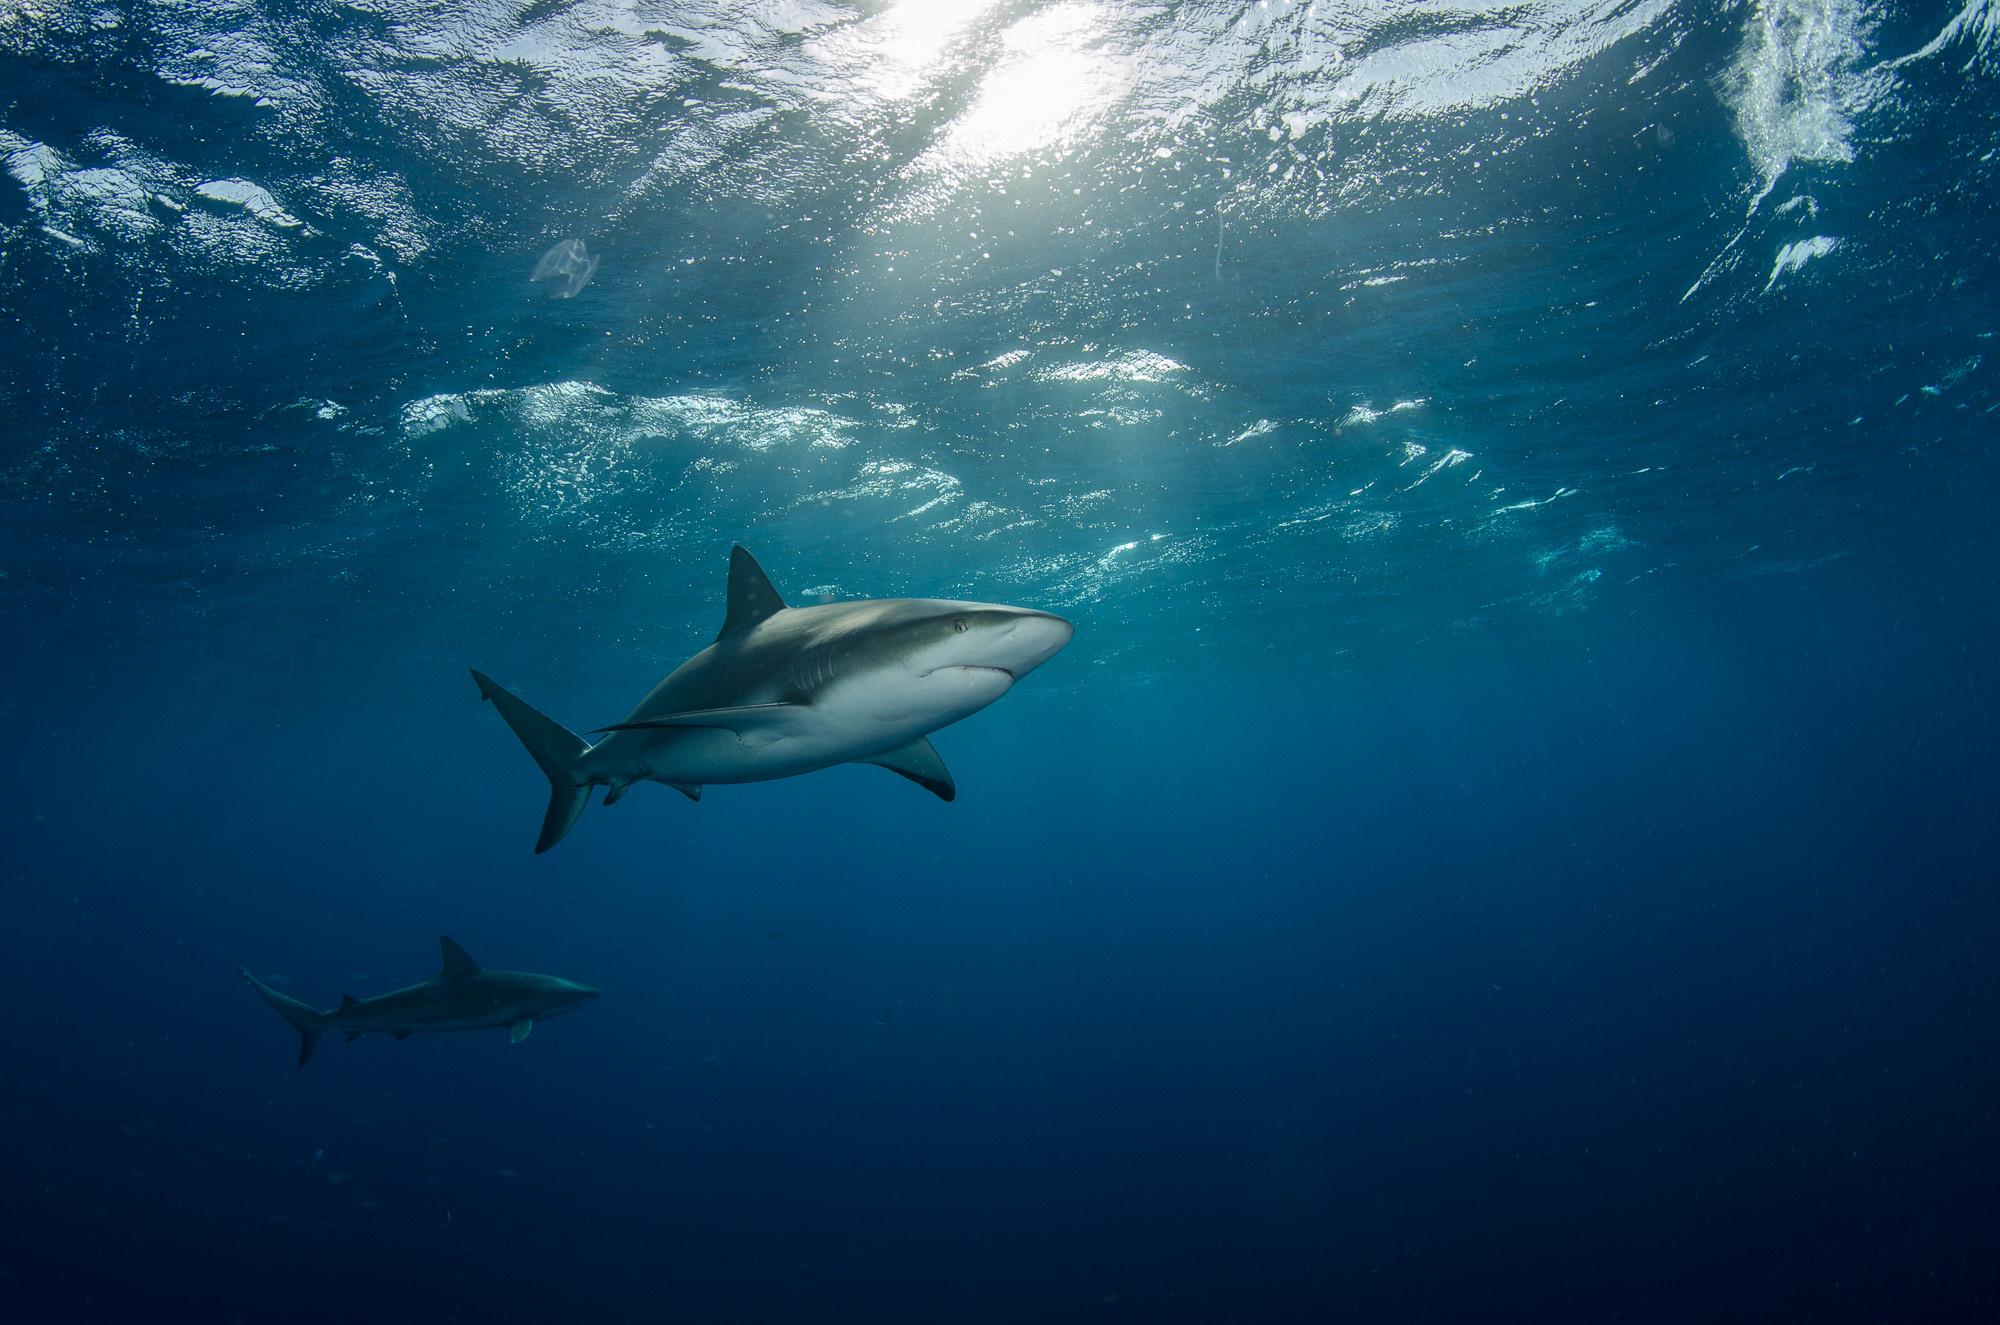 отмечают лучшие картинки акул люди устанавливают